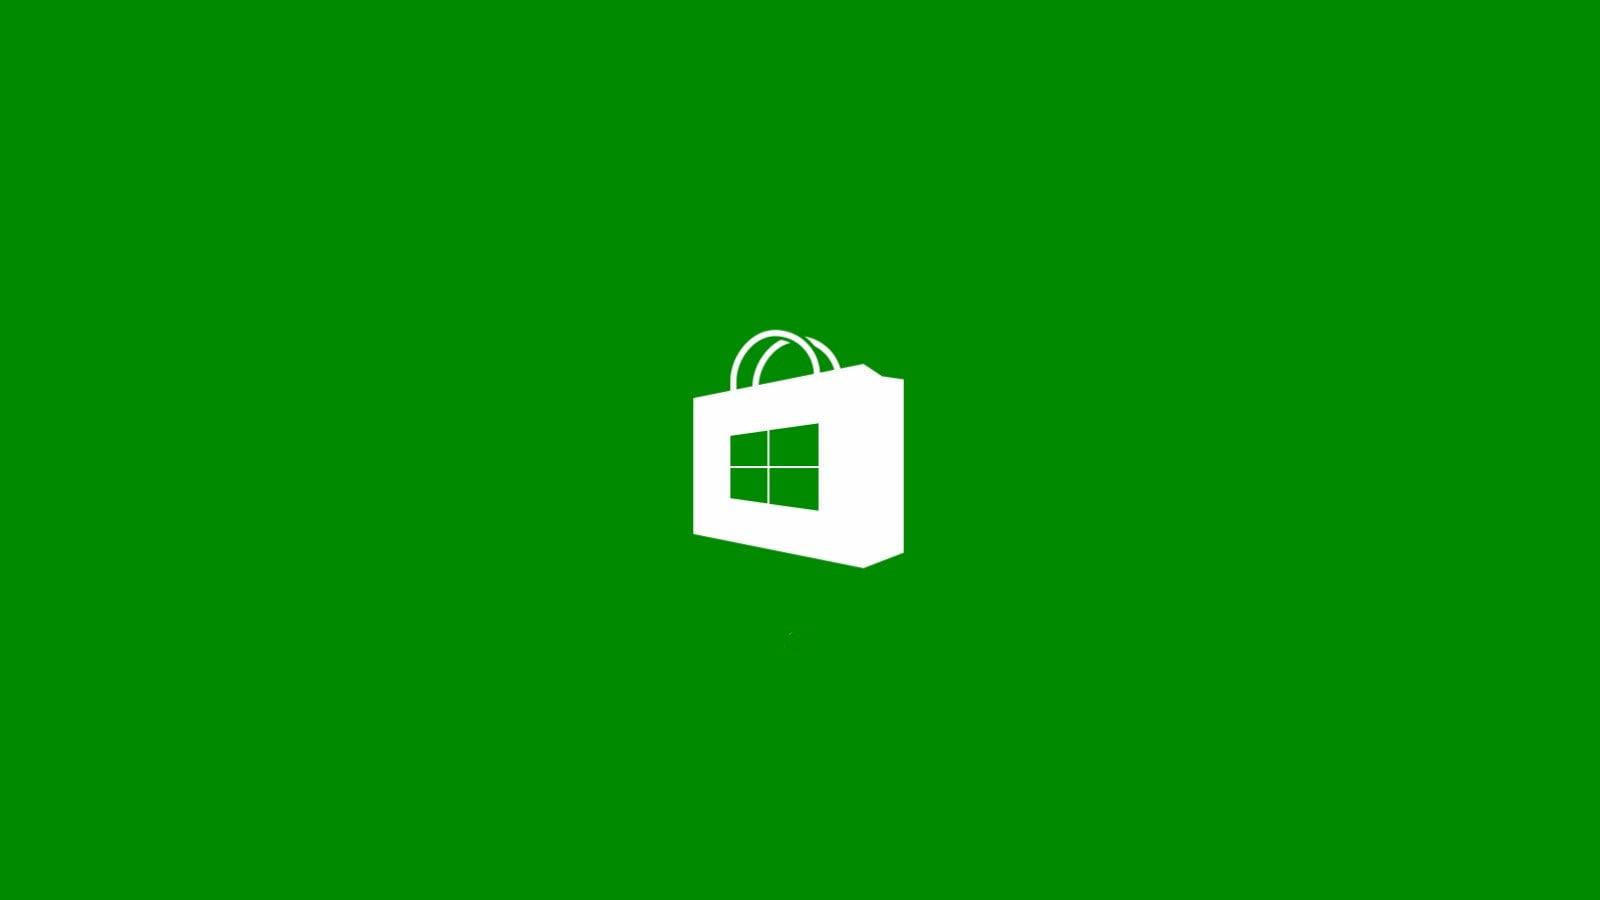 Windows Store - Tienda